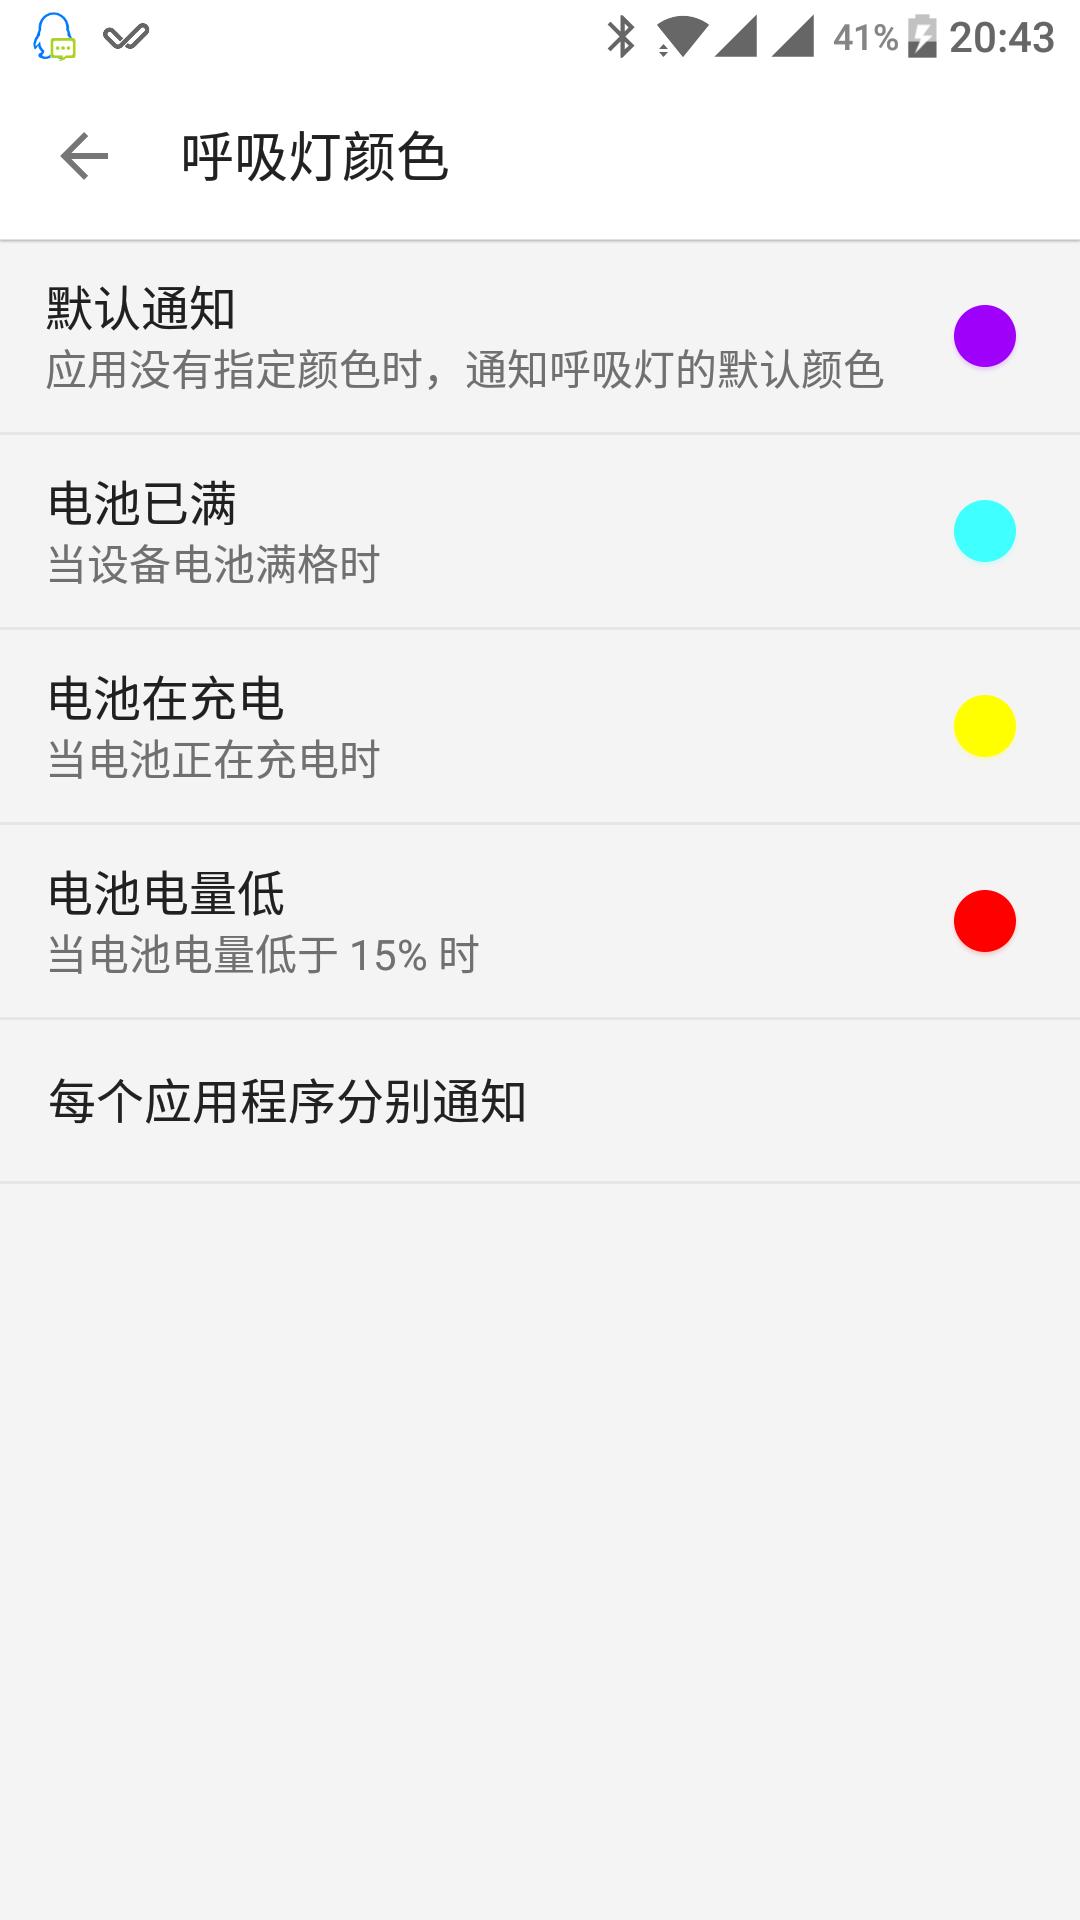 Screenshot_20170127-204343.png